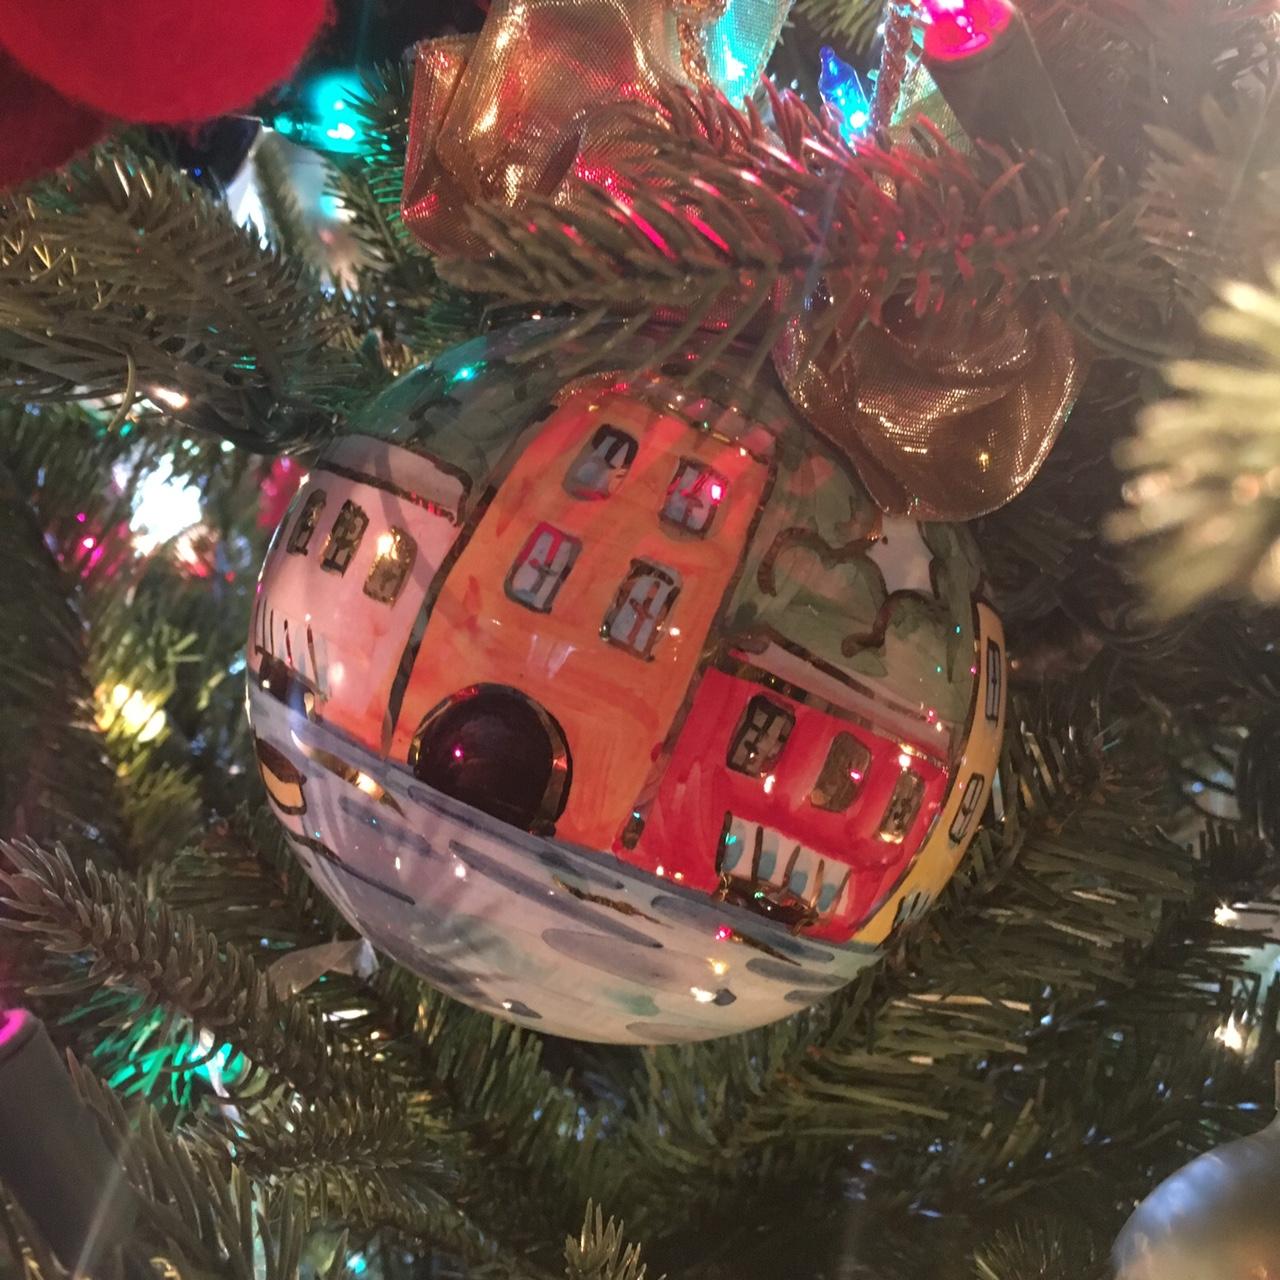 My Top Ten Favorite Christmas Ornaments - Blogs & Forums